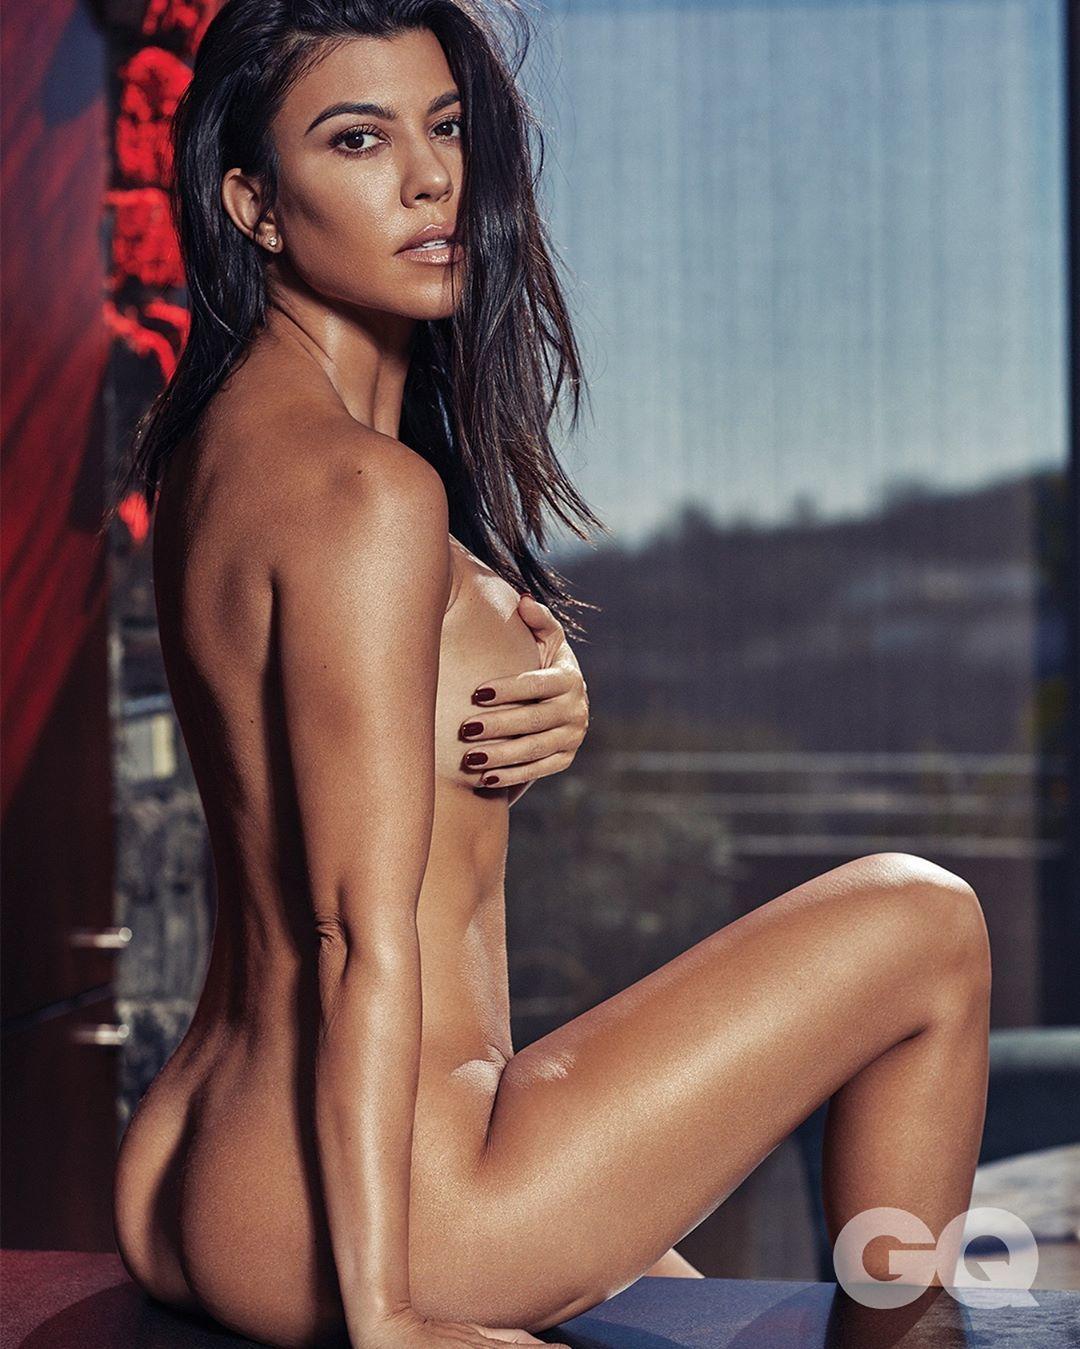 Hobi Topless, Ini Gaya Seksi Kourtney Kardashian